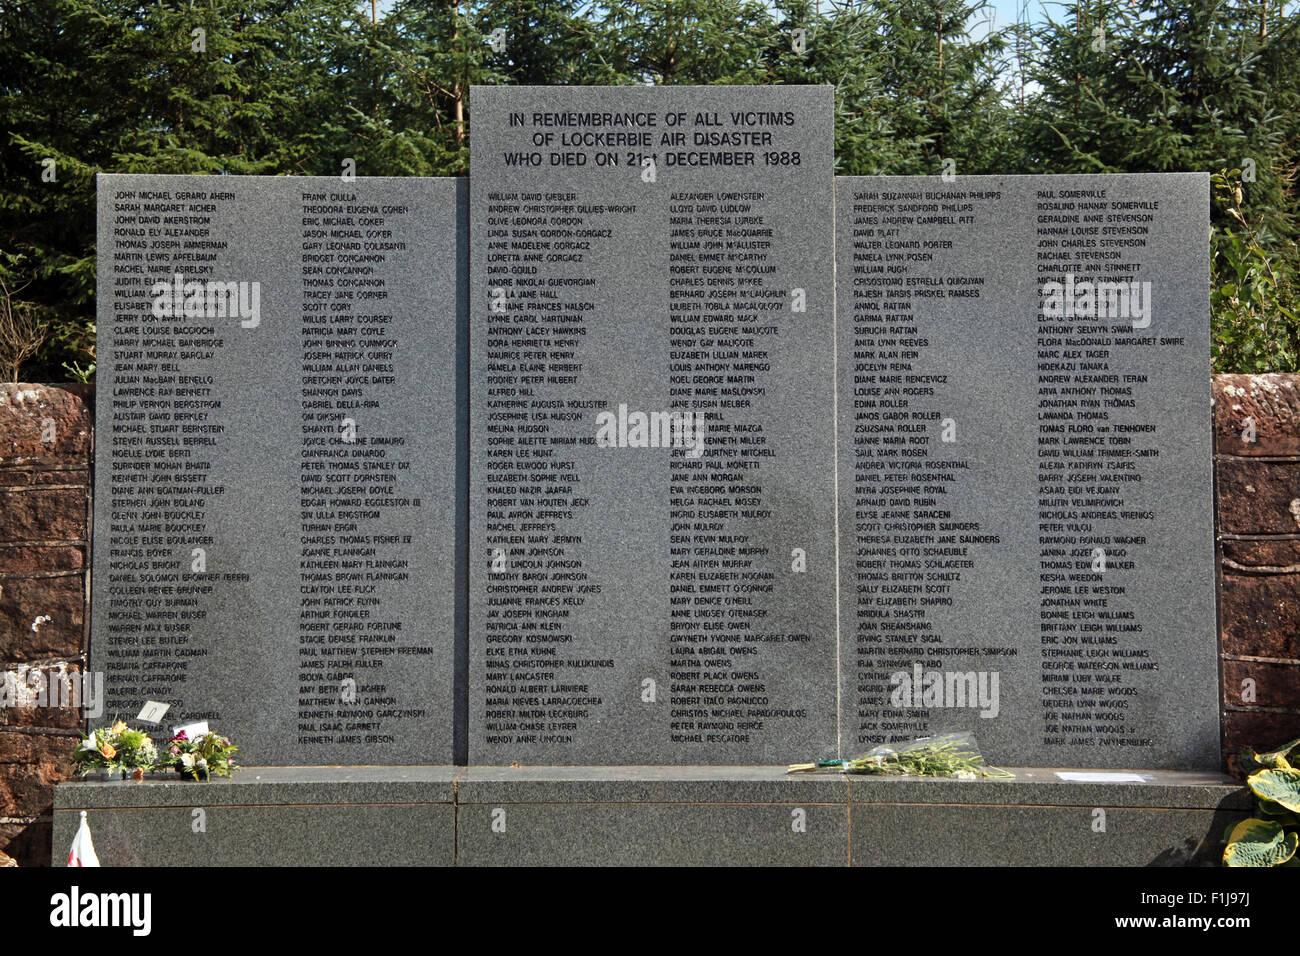 Lockerbie PanAm103 Victims Memorial,Scotland - Stock Image